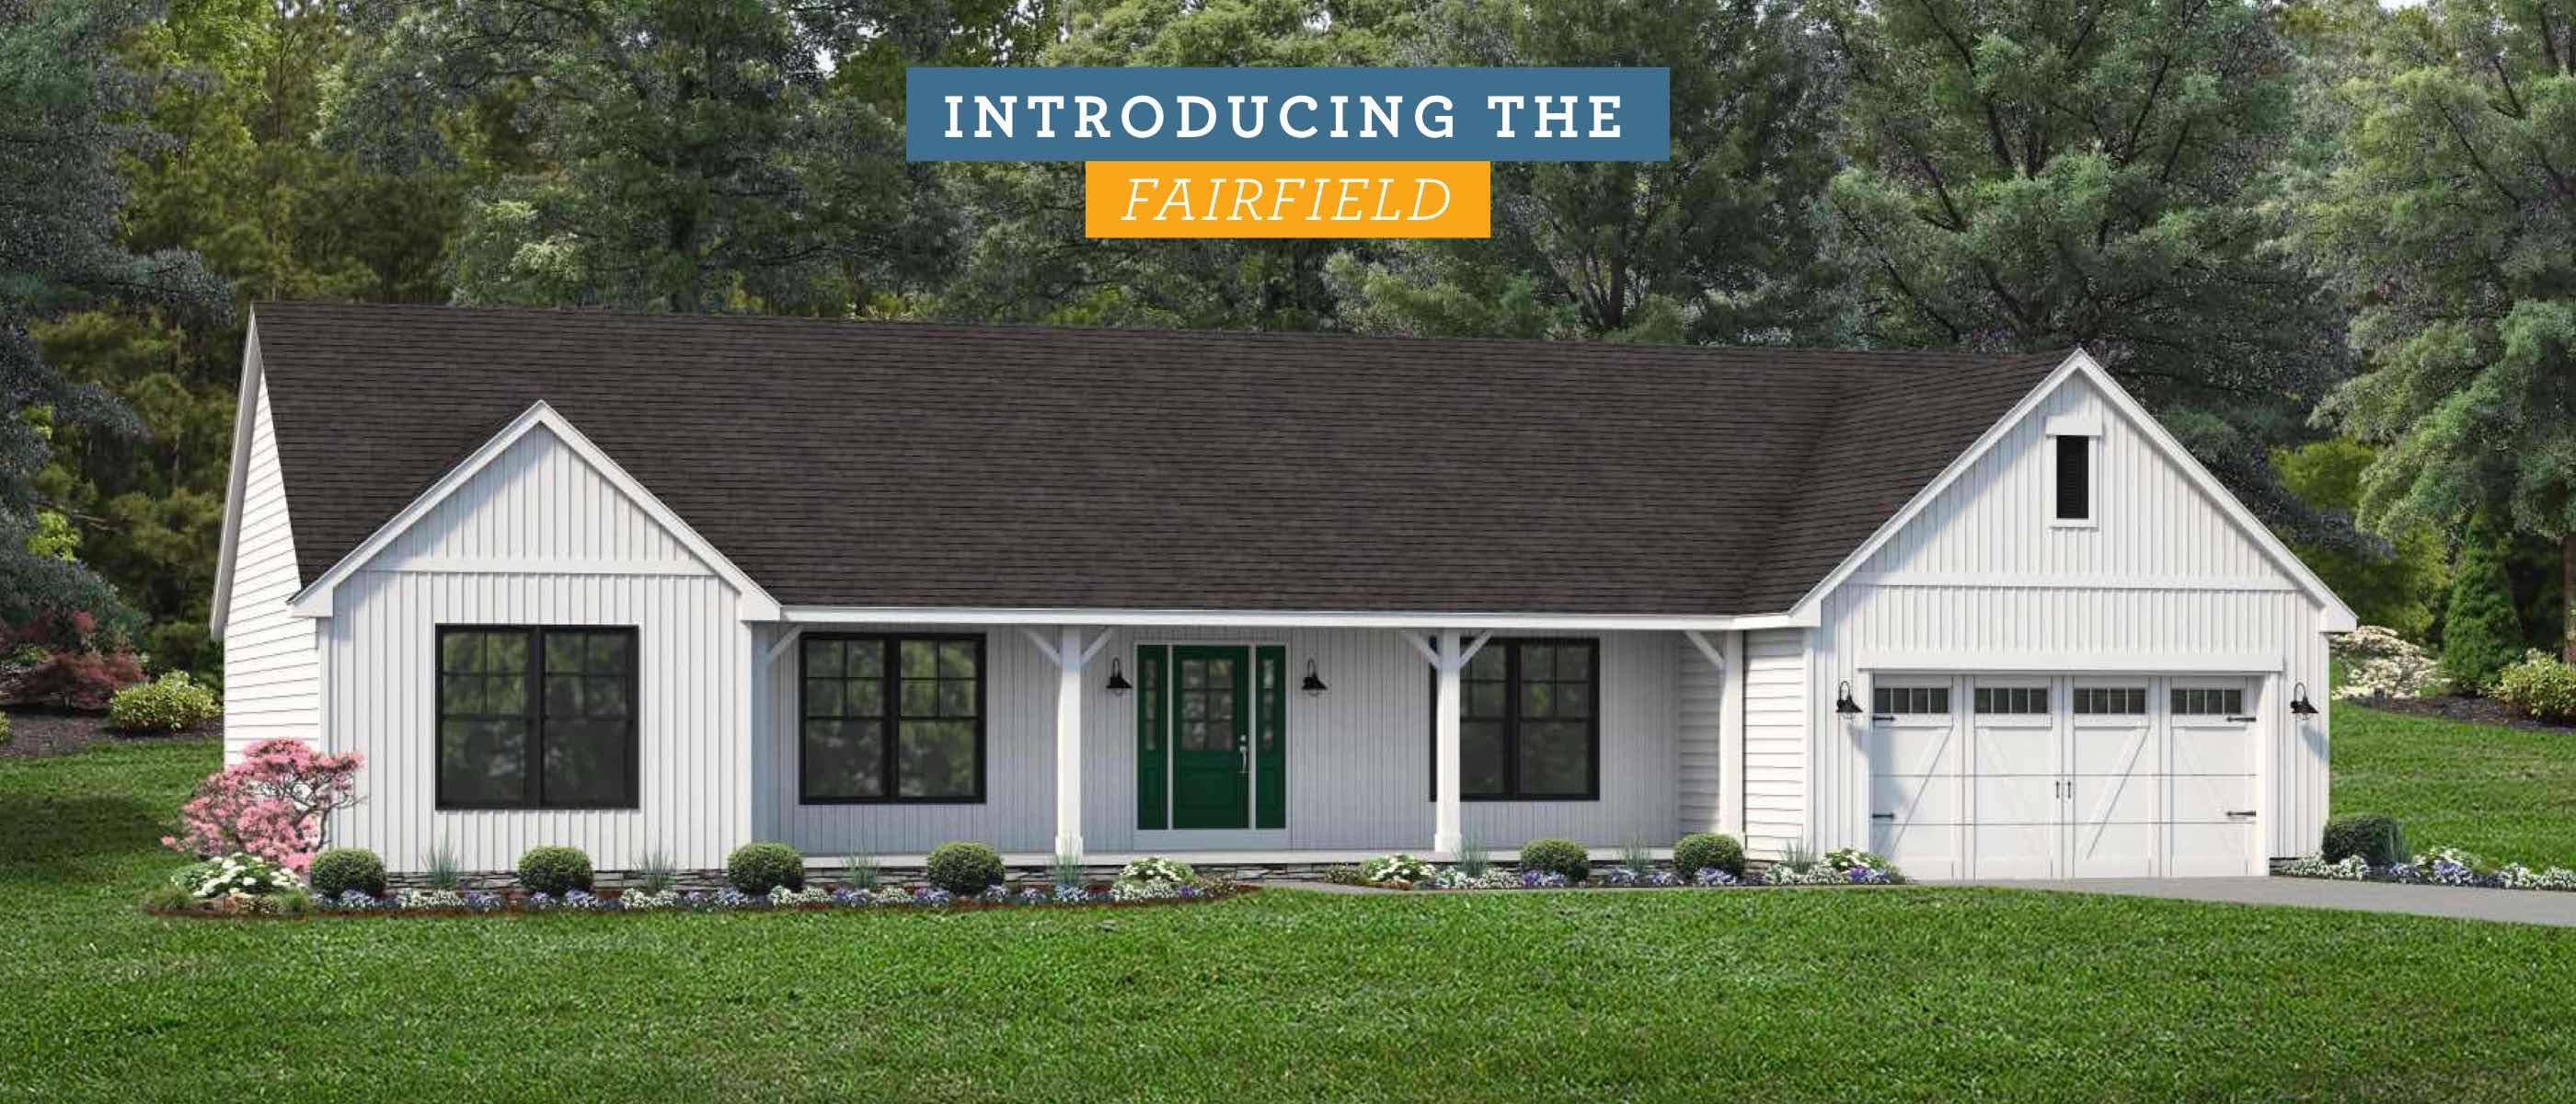 BW_Blog_New Floor Plan Meet the Fairfield